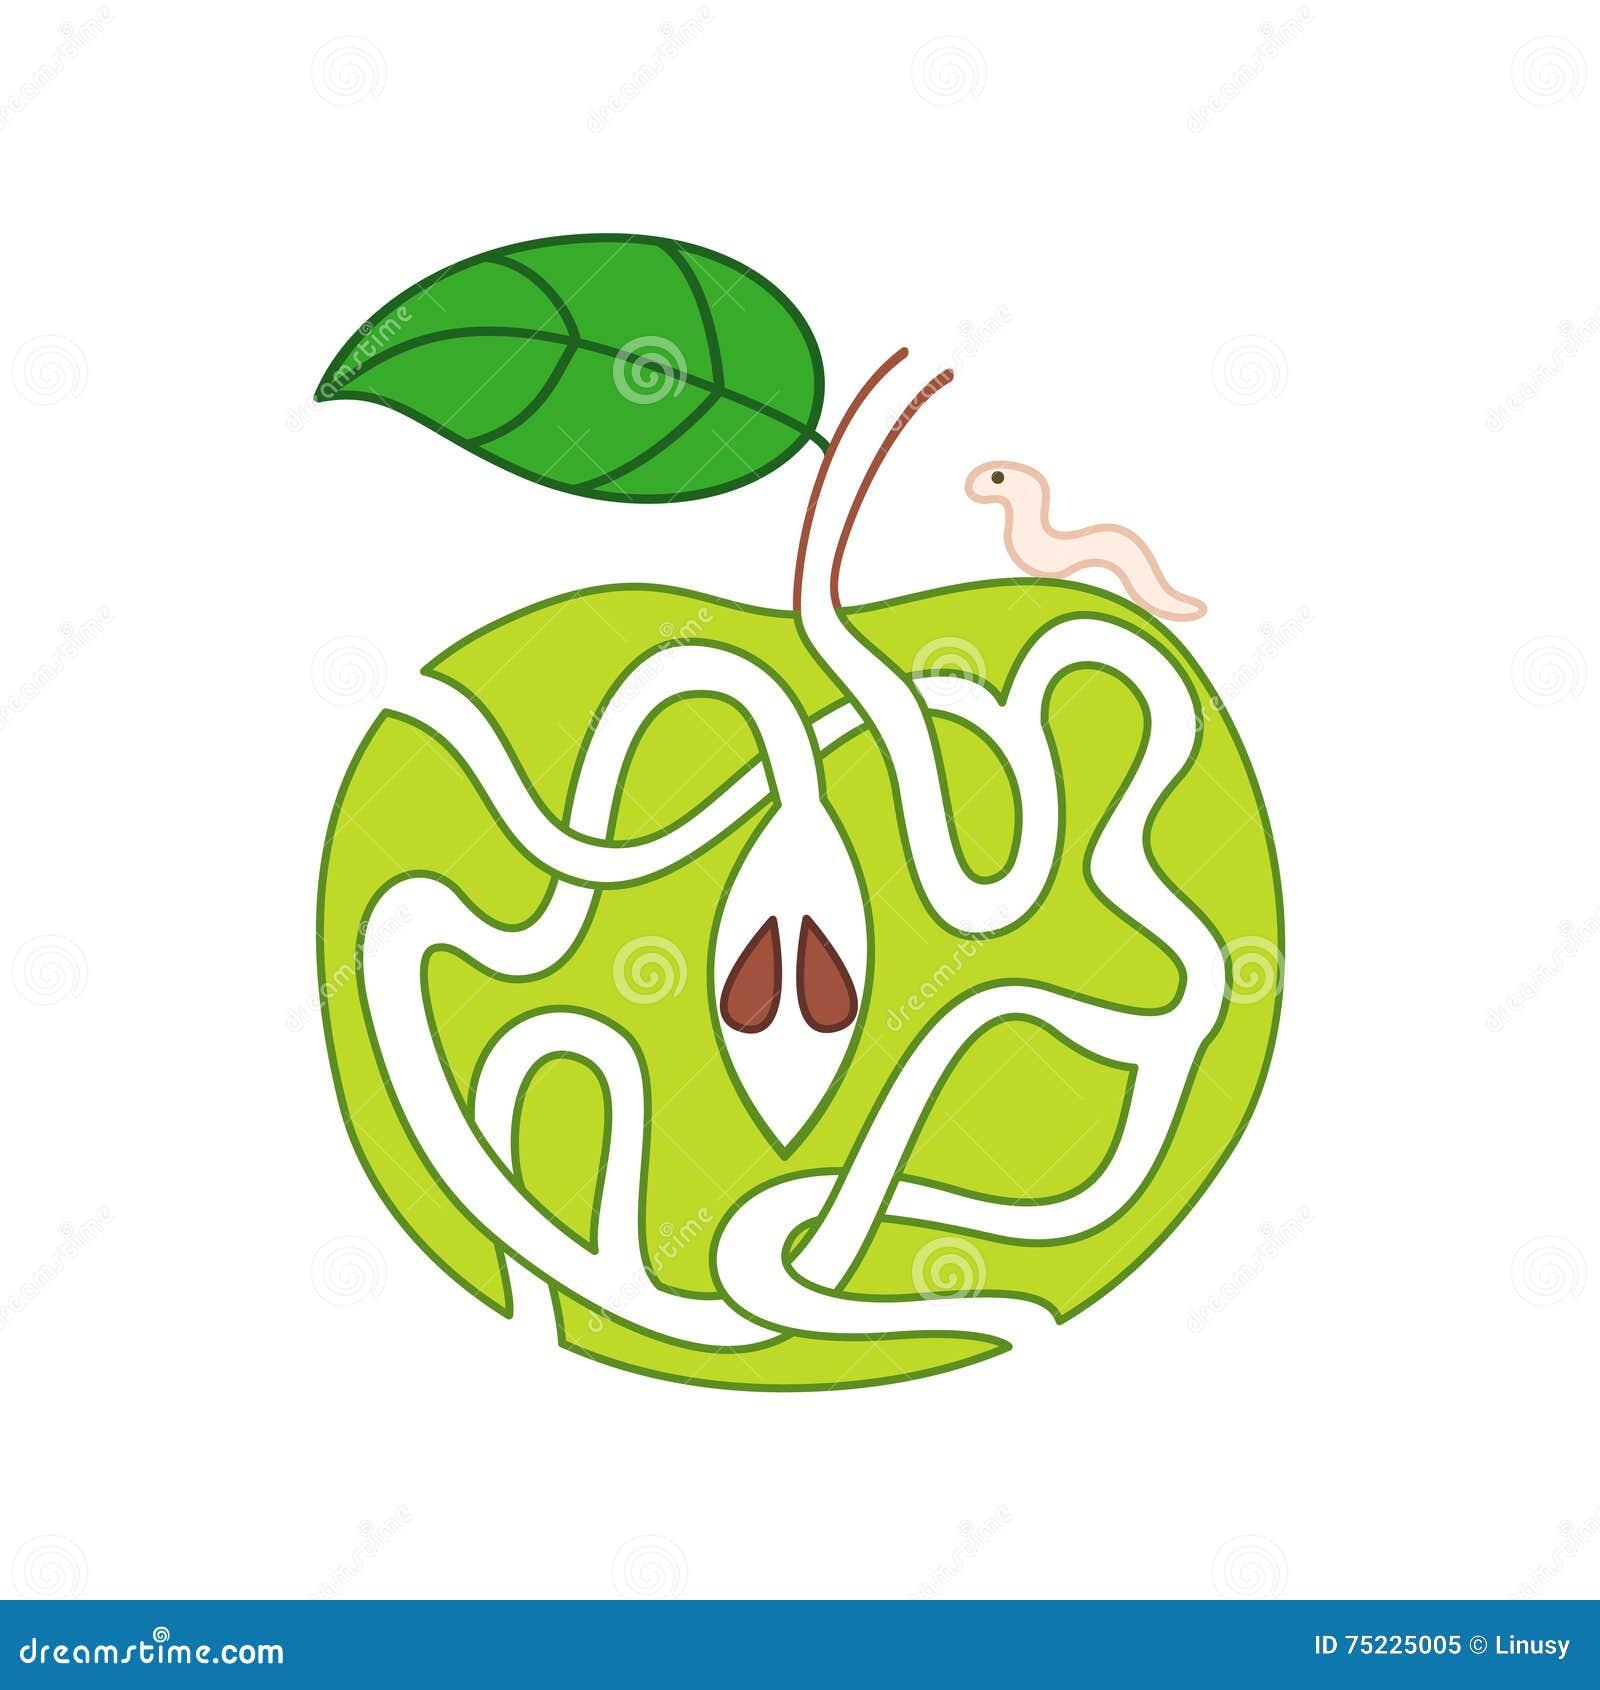 Fruit Maze Stock Illustrations – 143 Fruit Maze Stock Illustrations ...